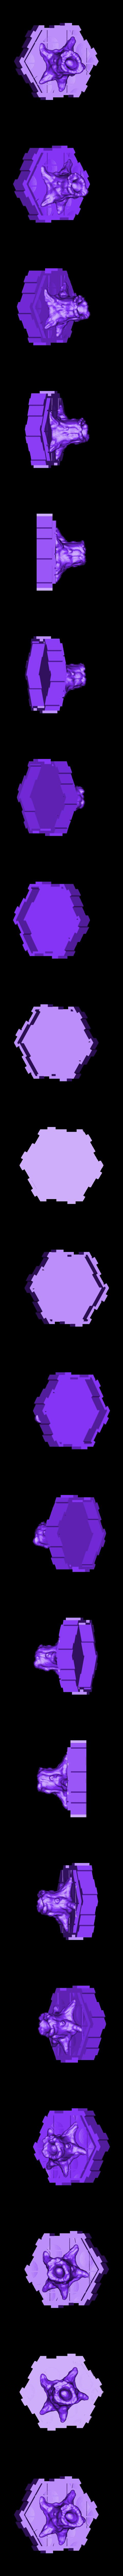 1hex_with_treestump.stl Download free STL file Locking Hex Terrain Stone Path • 3D print object, mrhers2